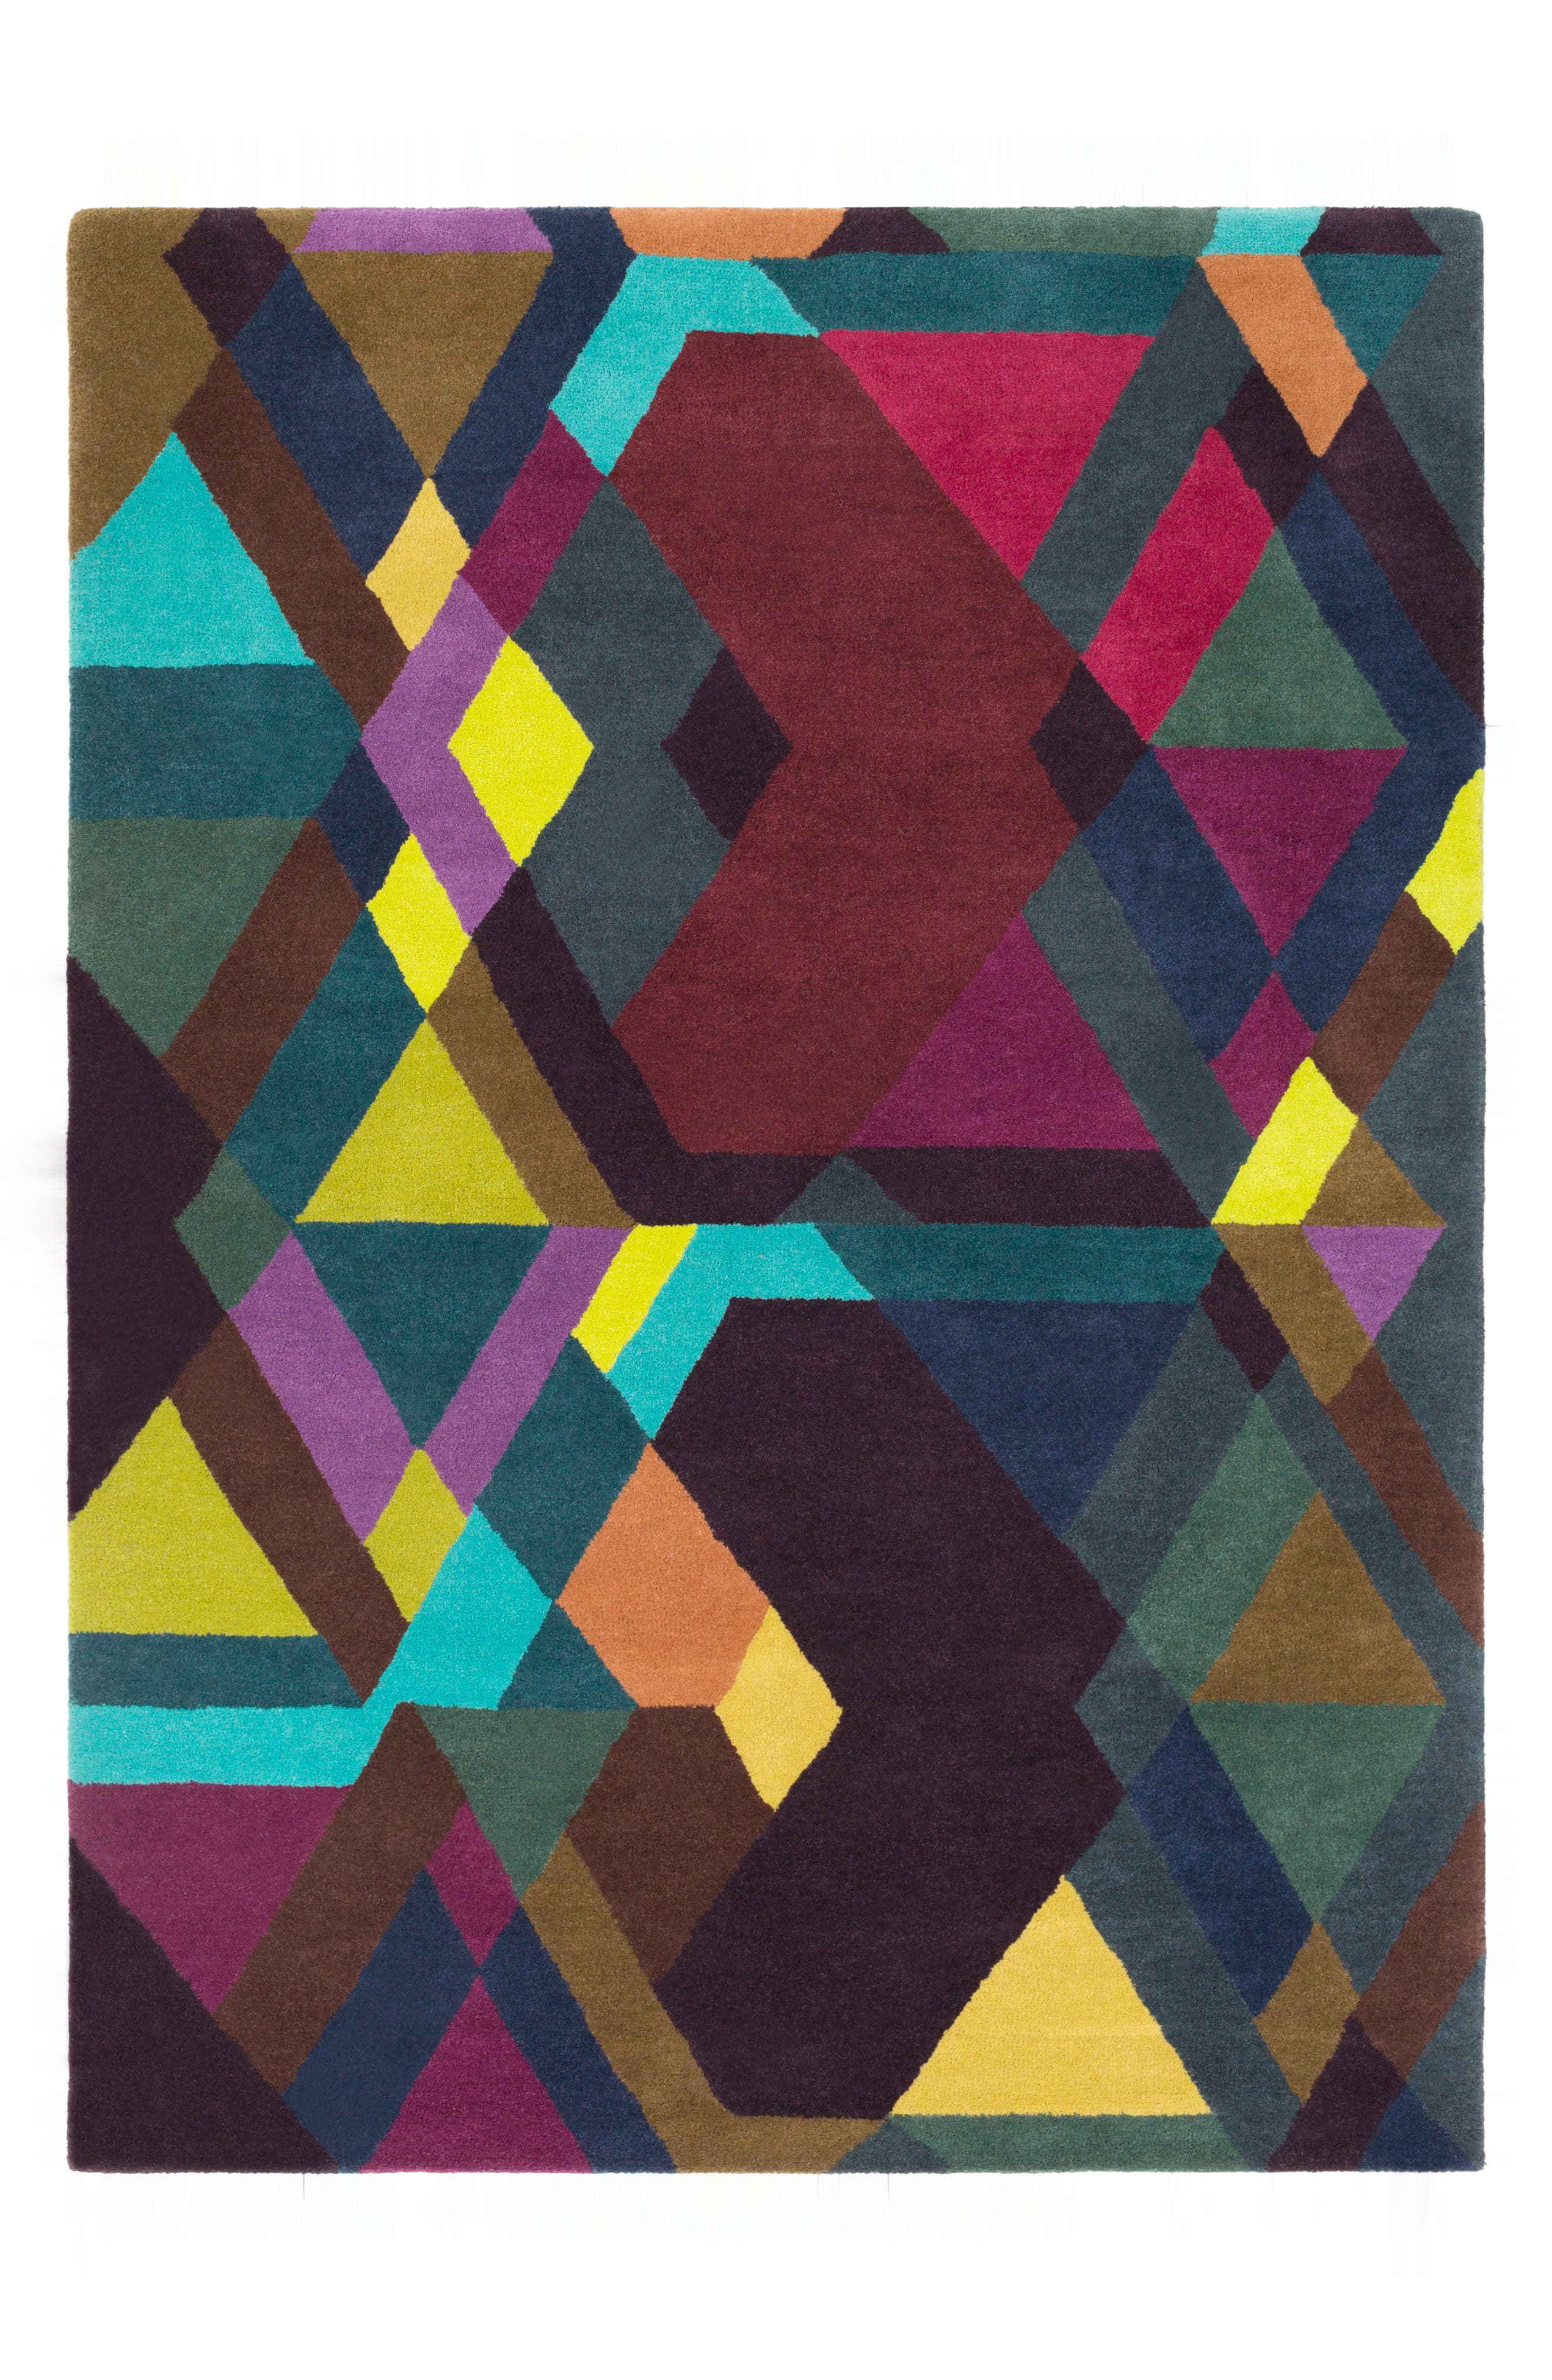 x Surya Iconic Wool Area Rug,                             Main thumbnail 1, color,                             PURPLE